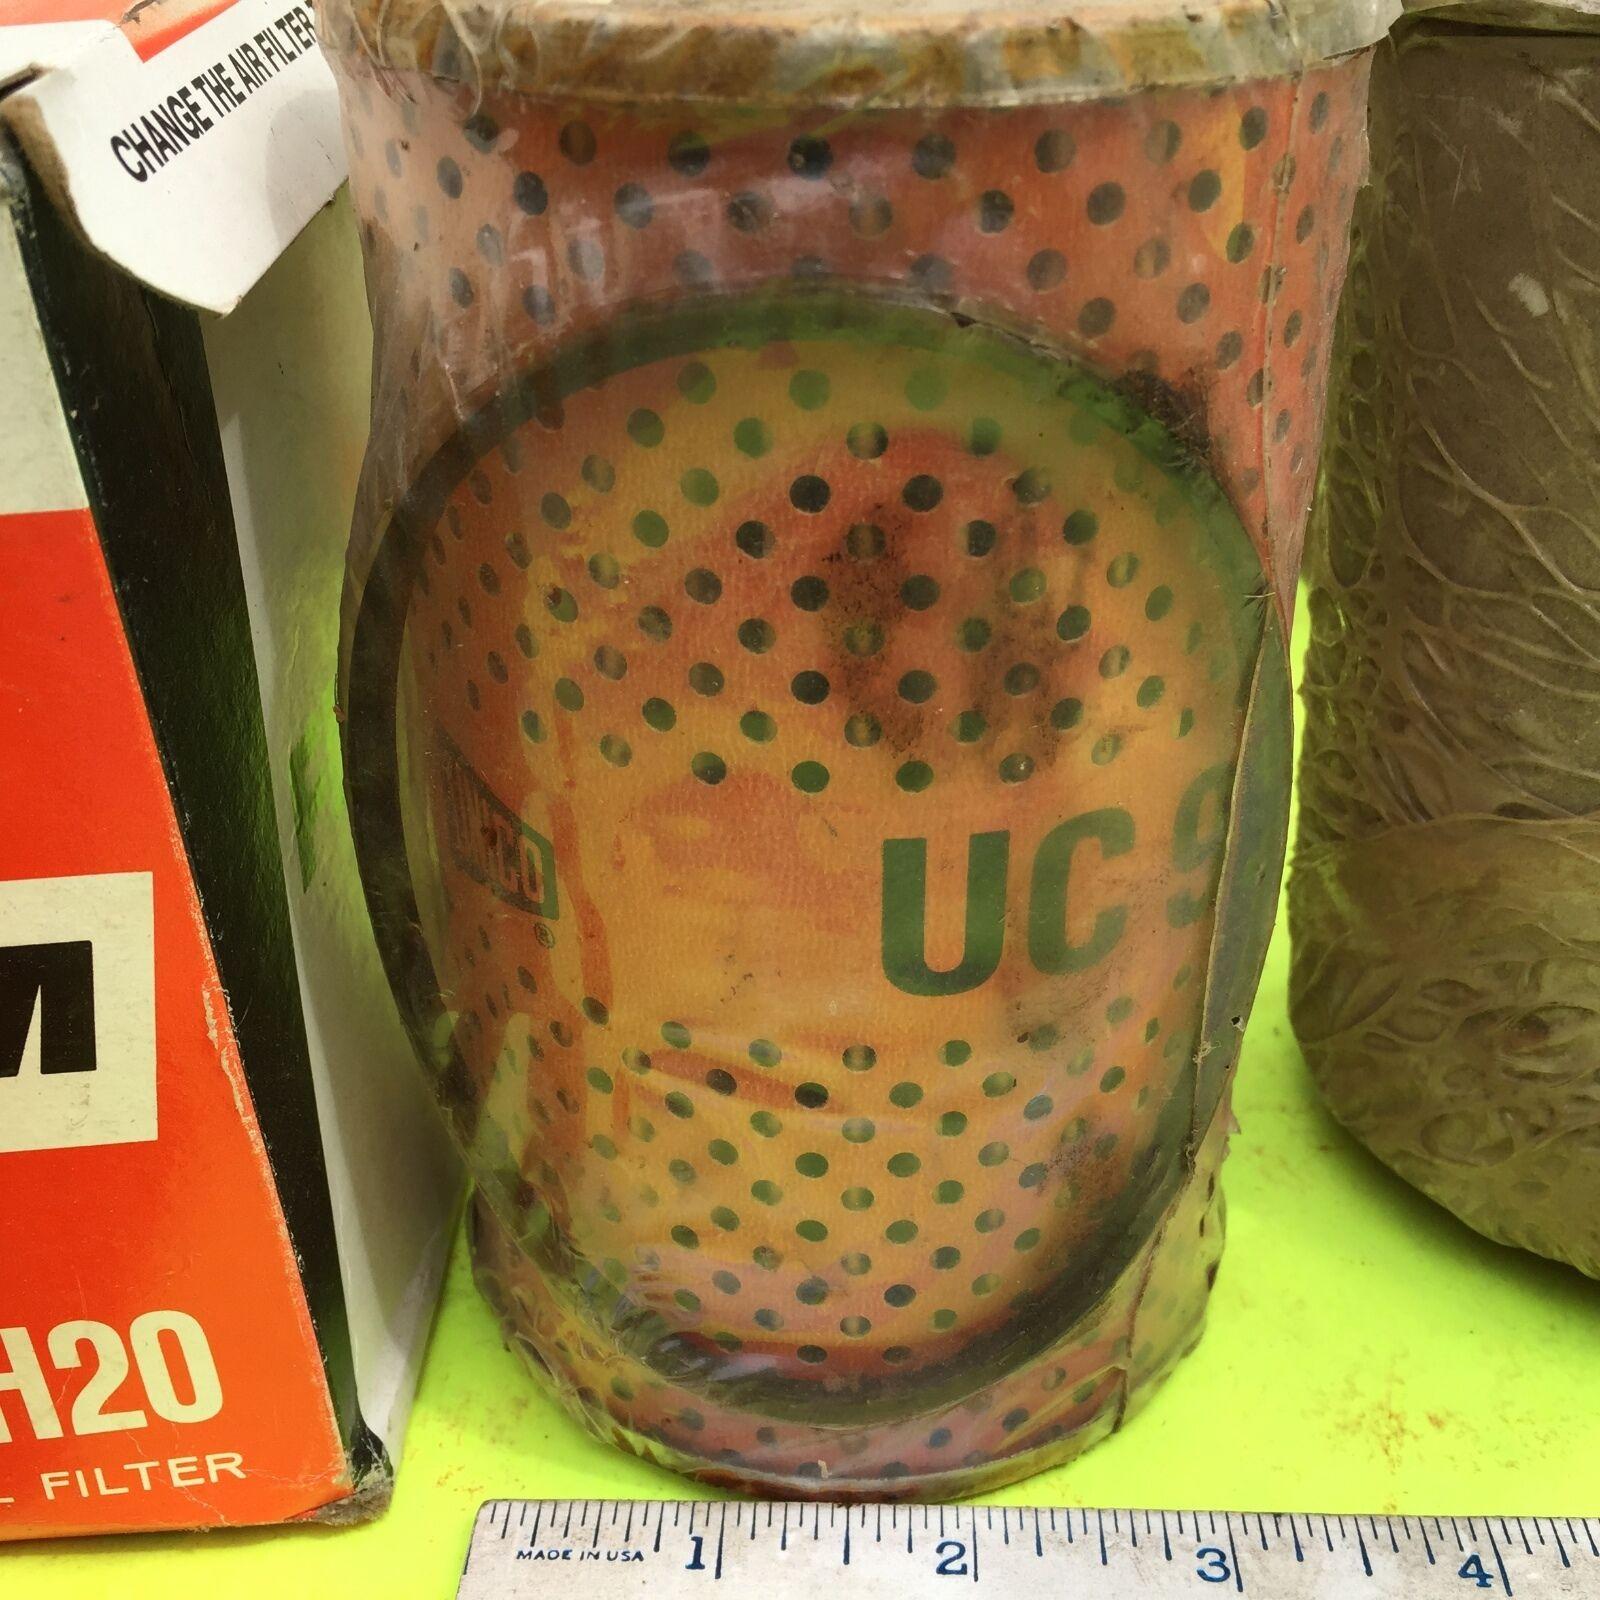 European old cars,  UNICO filter.    UC 99.       Item:  4657